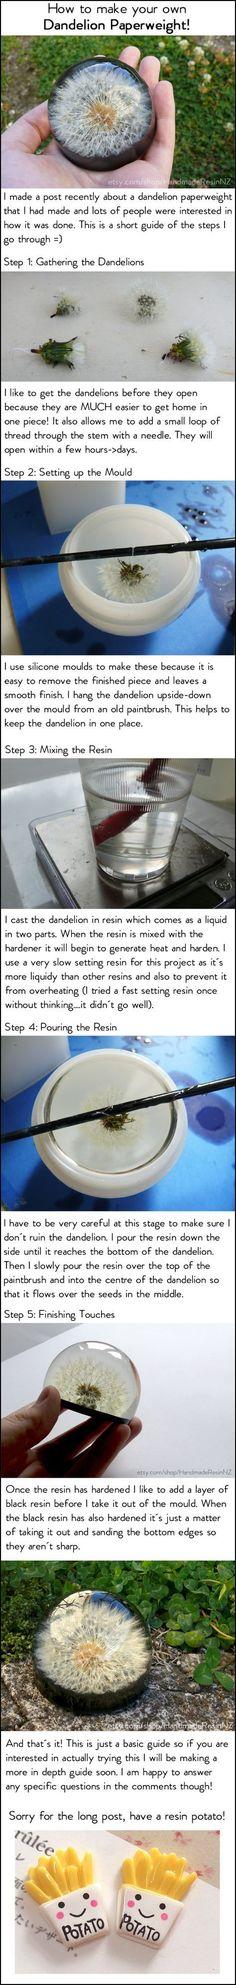 Dandelion paperweight tutorial! #HobbiesandCraftsetc